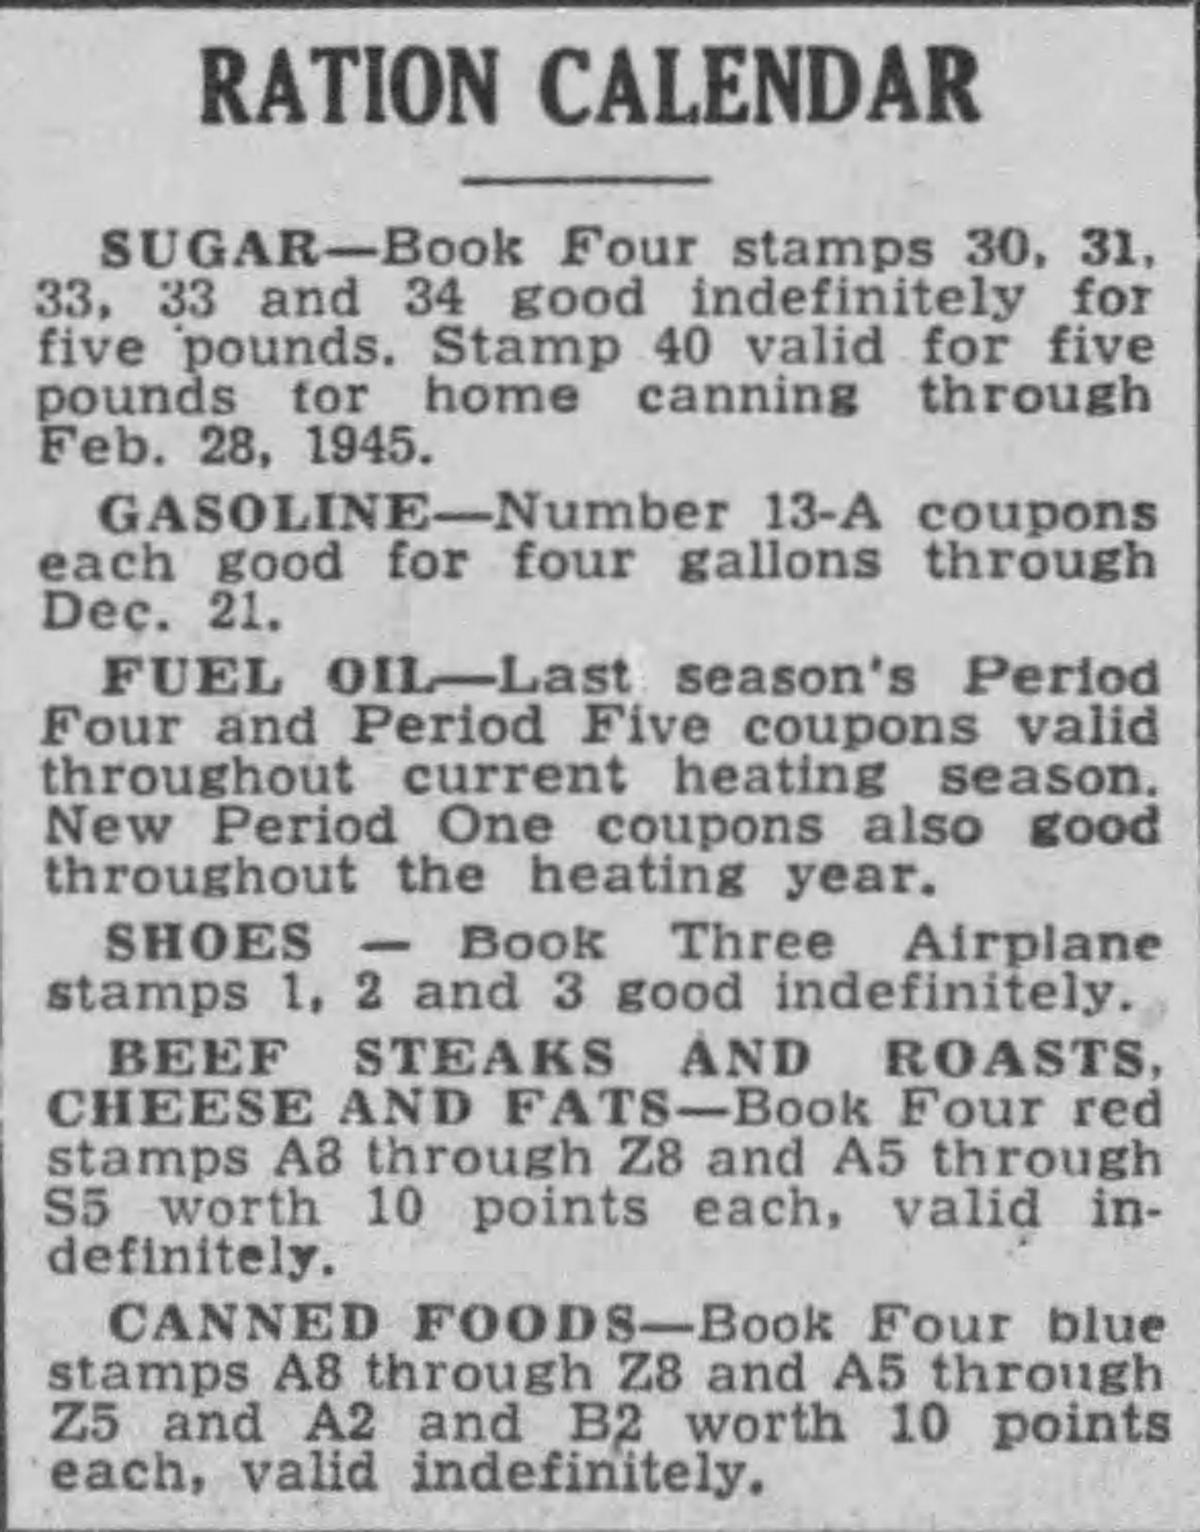 Ration calendar 1944